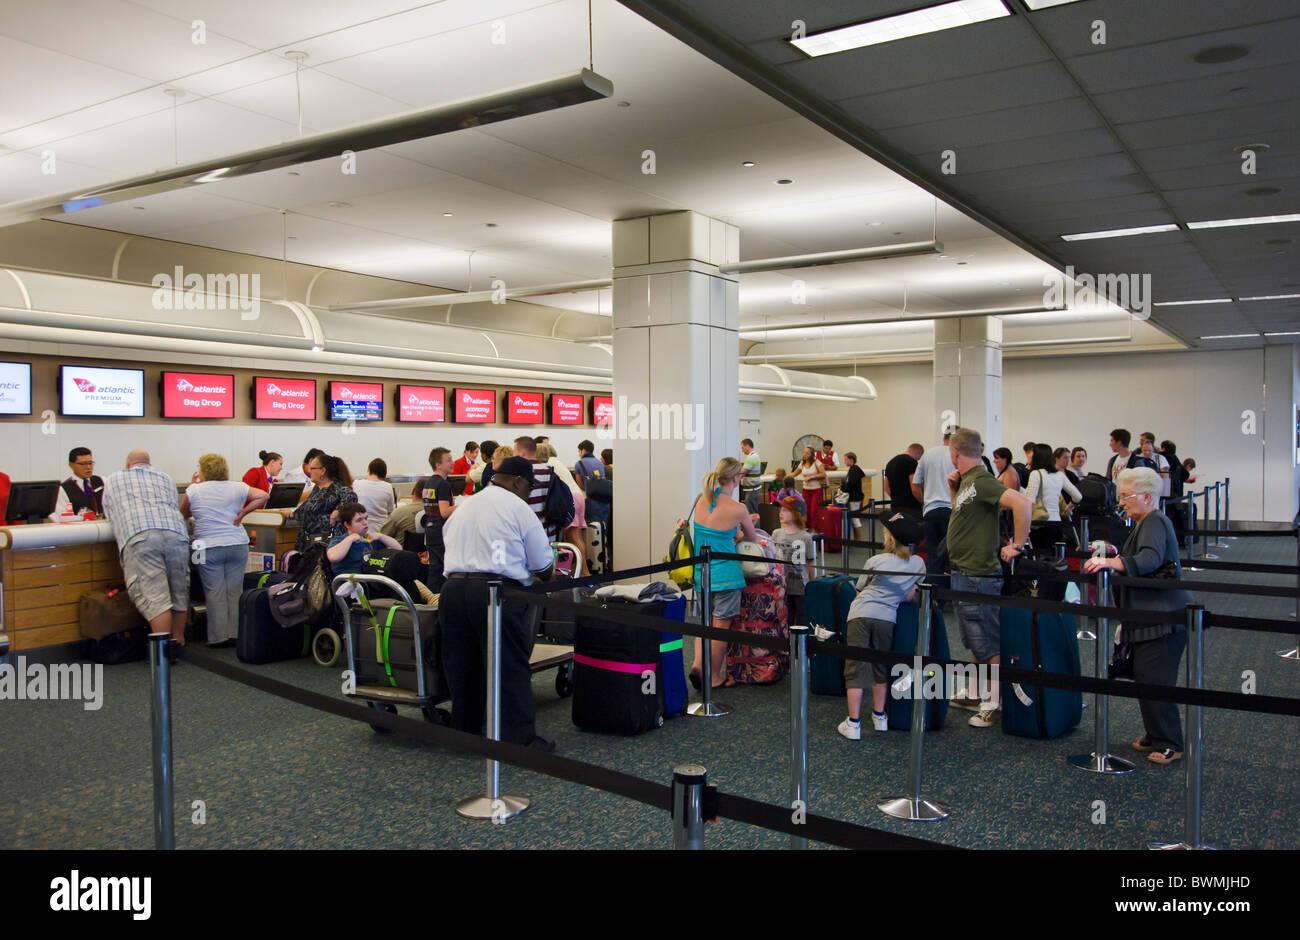 Virgin Atlantic Airways check-in desks at Orlando International Airport, Florida, USA - Stock Image